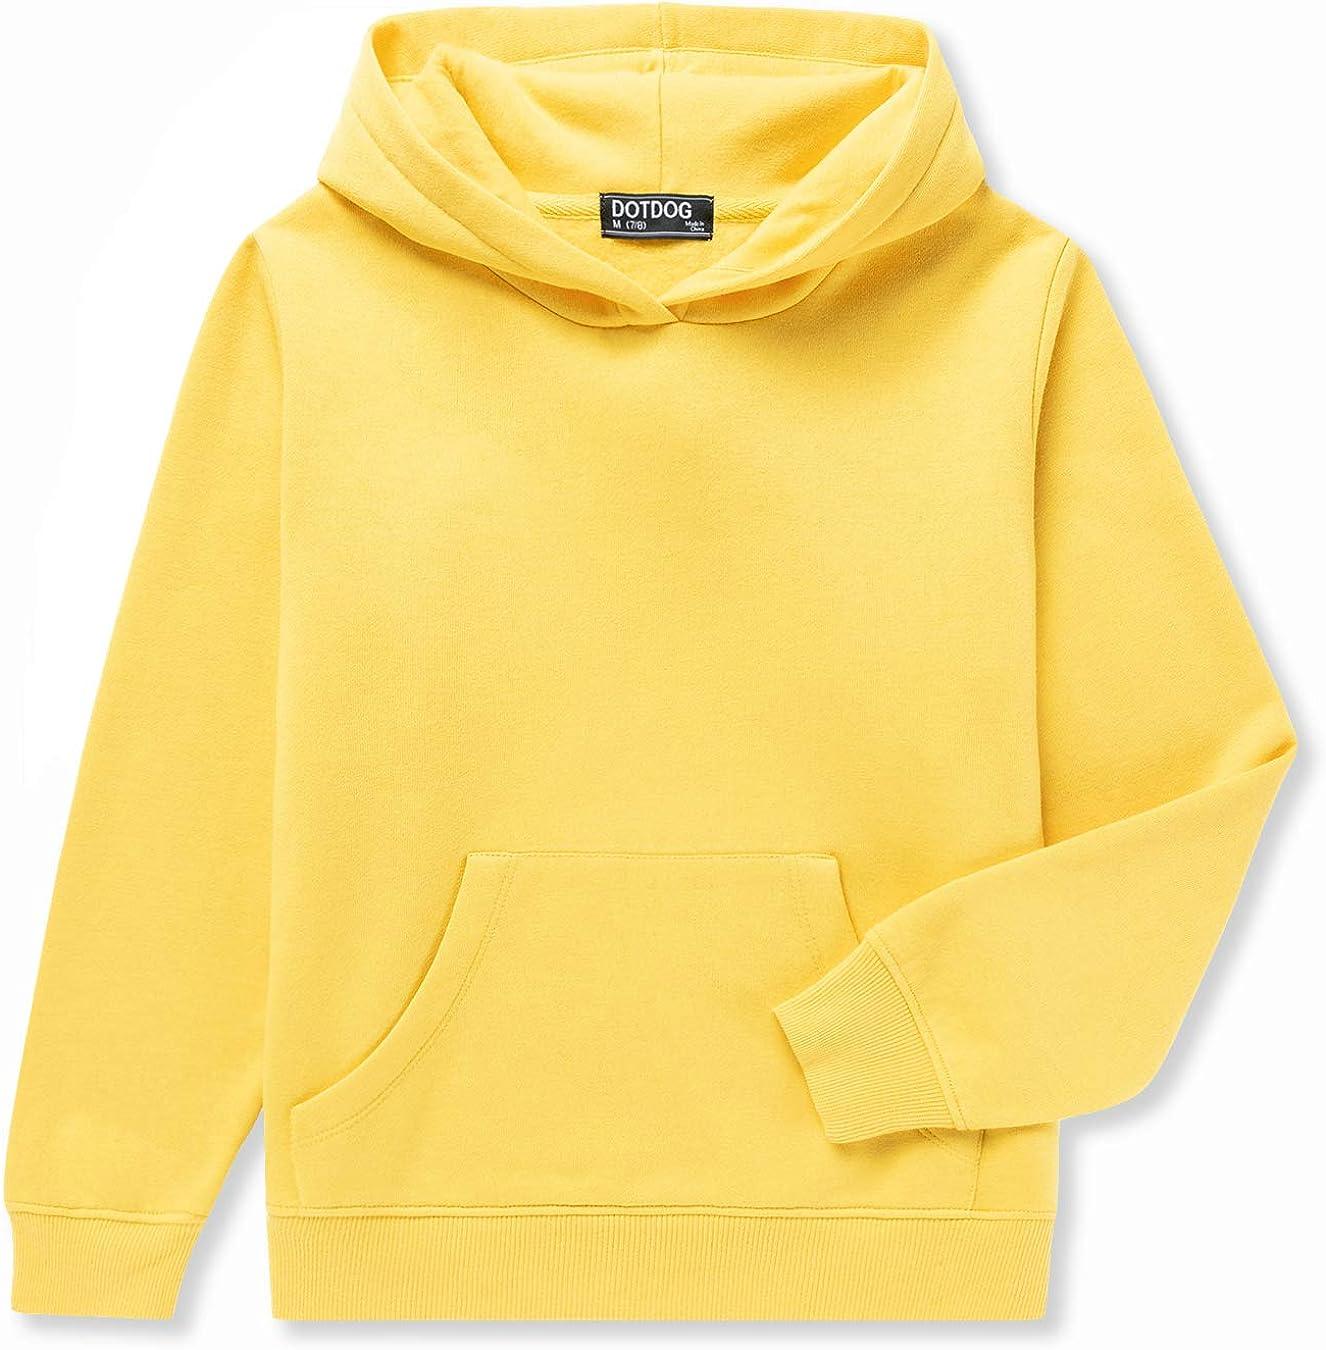 DOTDOG Unisex Kids Soft Brushed Sweatshir Hooded Pullover Super Special SALE held 67% OFF of fixed price Fleece